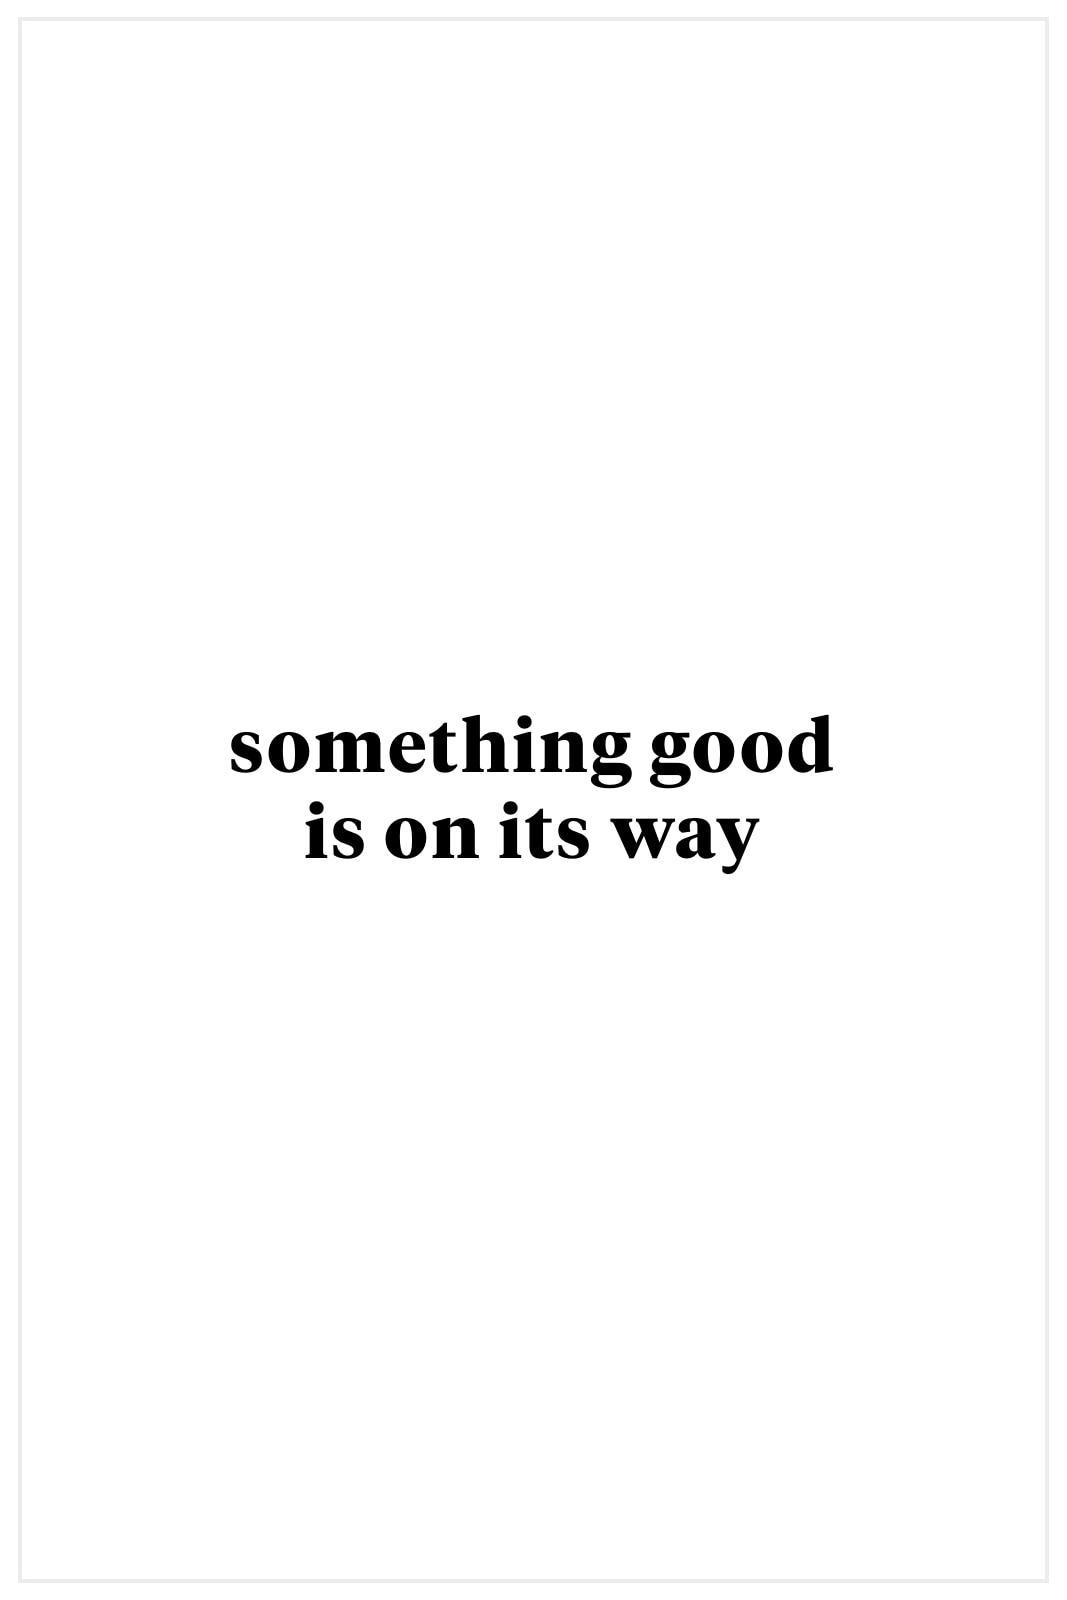 Cleo Paperclip Chain Bracelet